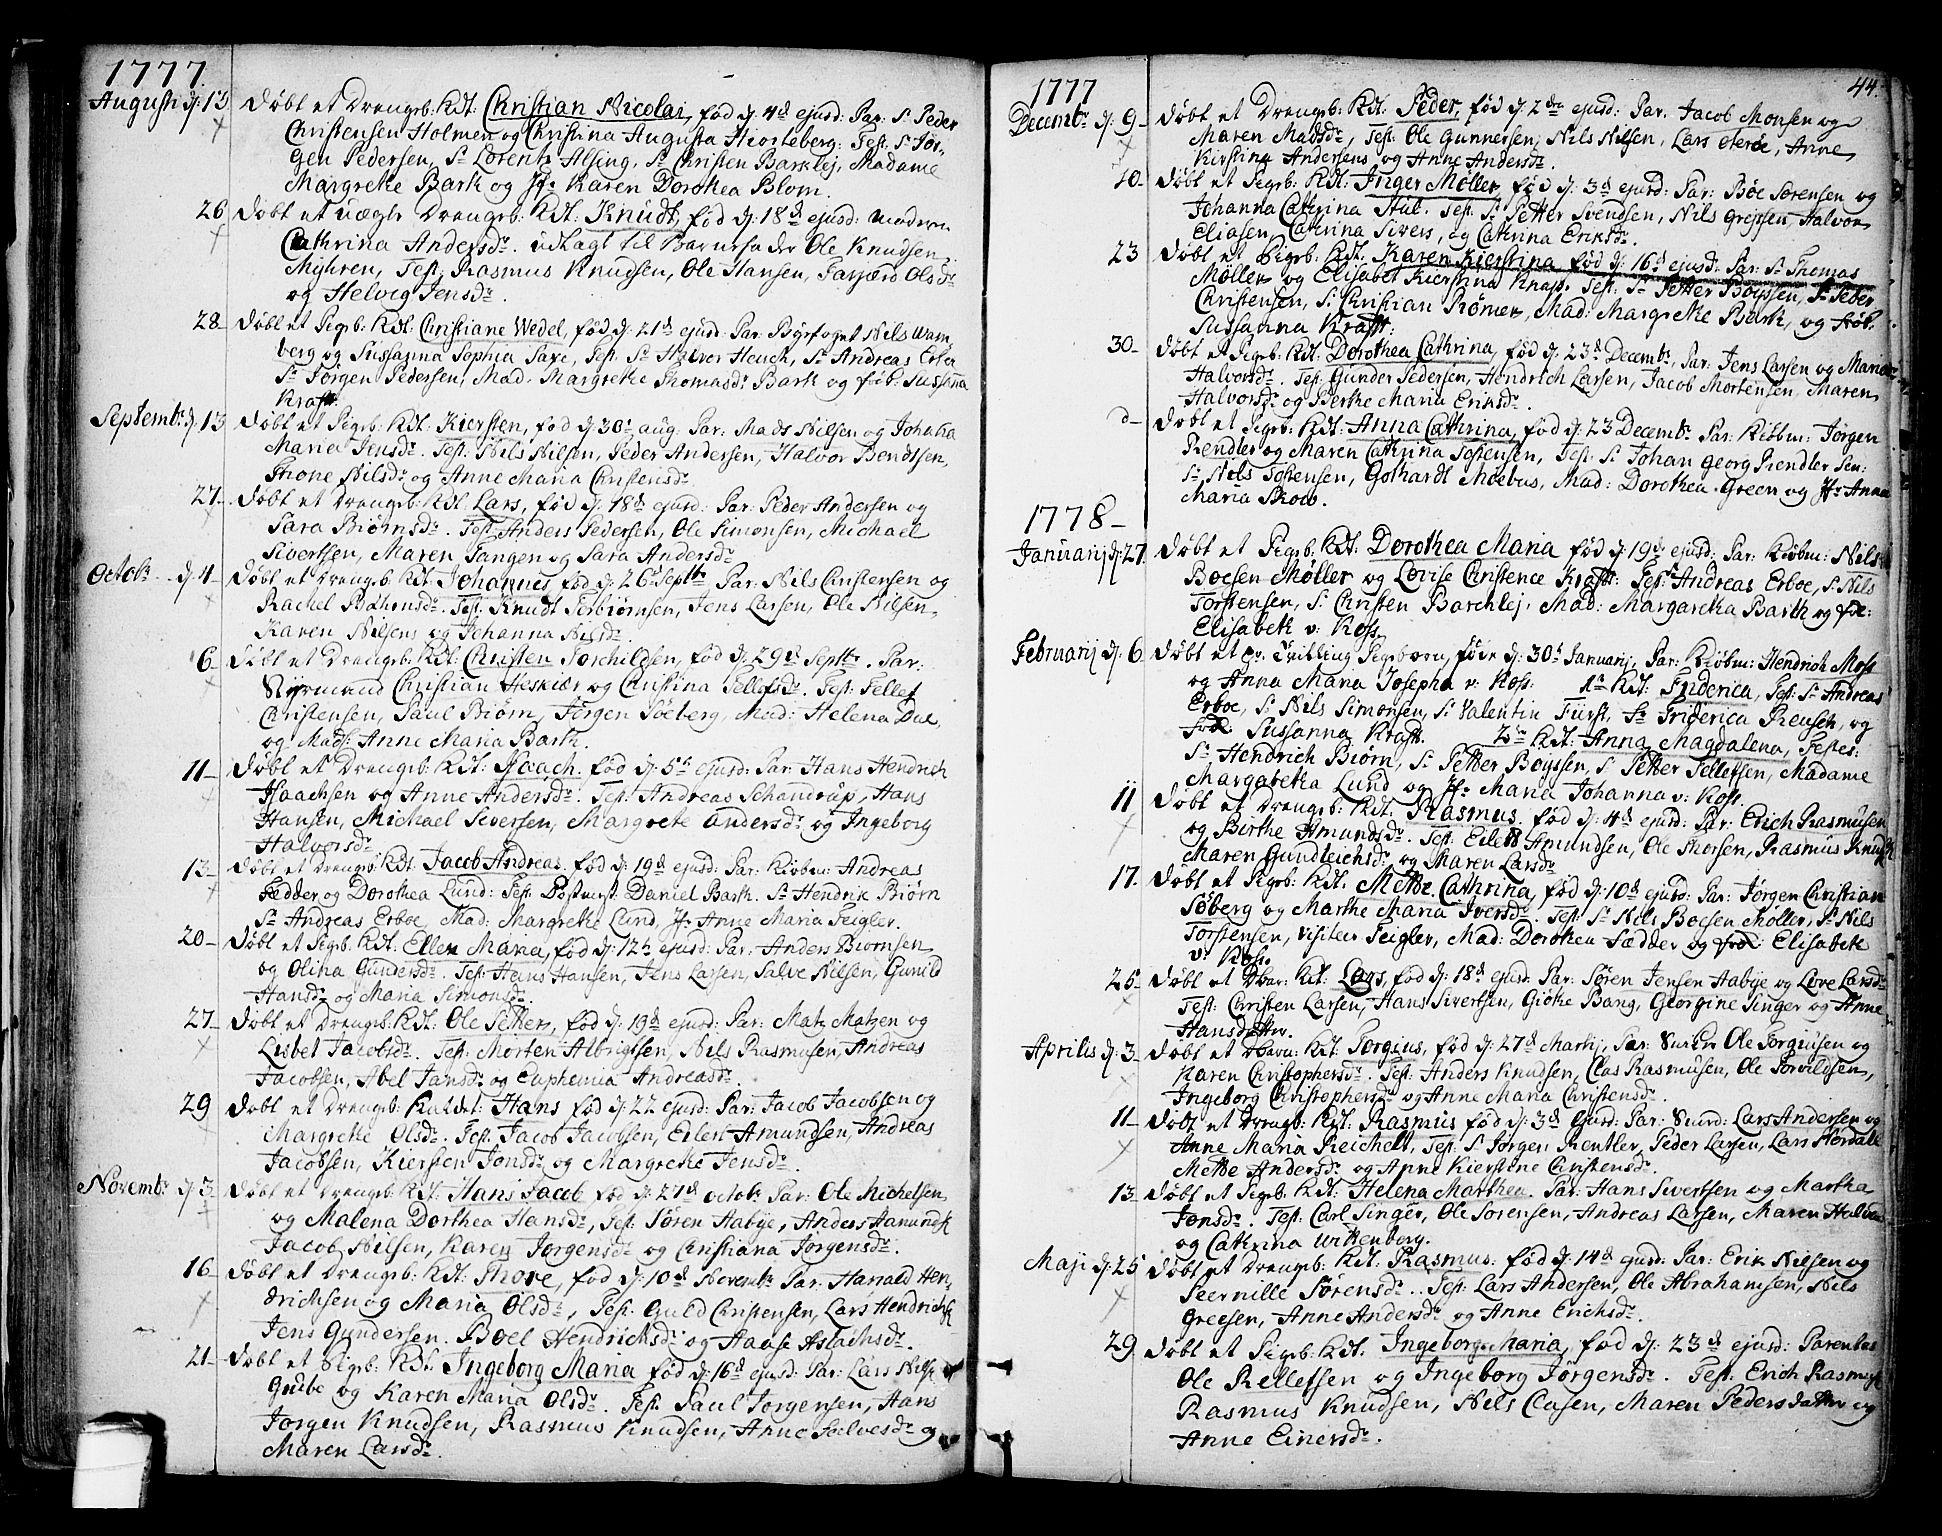 SAKO, Kragerø kirkebøker, F/Fa/L0002: Ministerialbok nr. 2, 1767-1802, s. 44